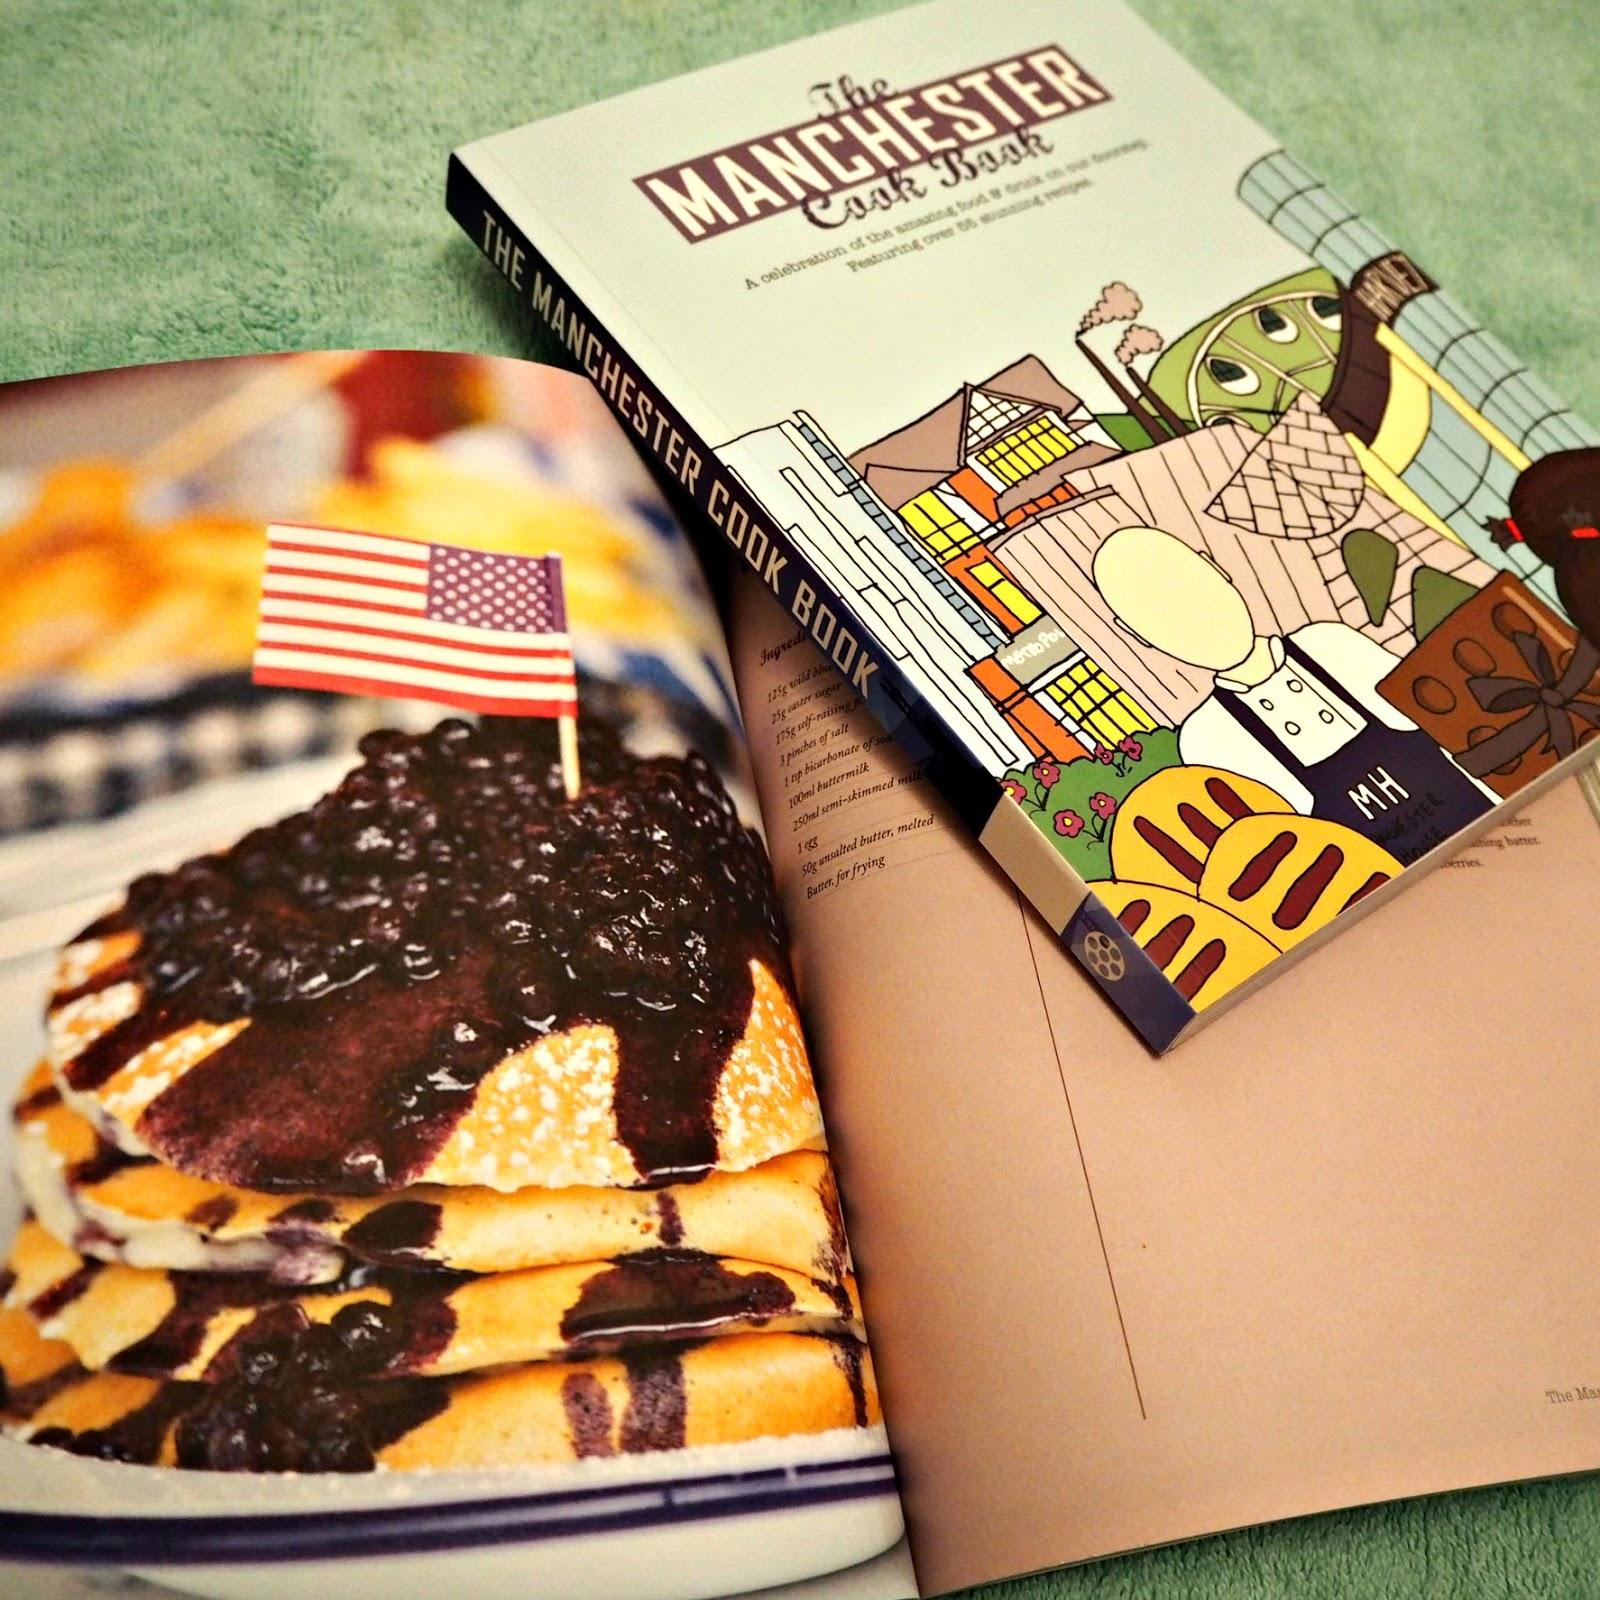 Pancake recipe inside cookbook